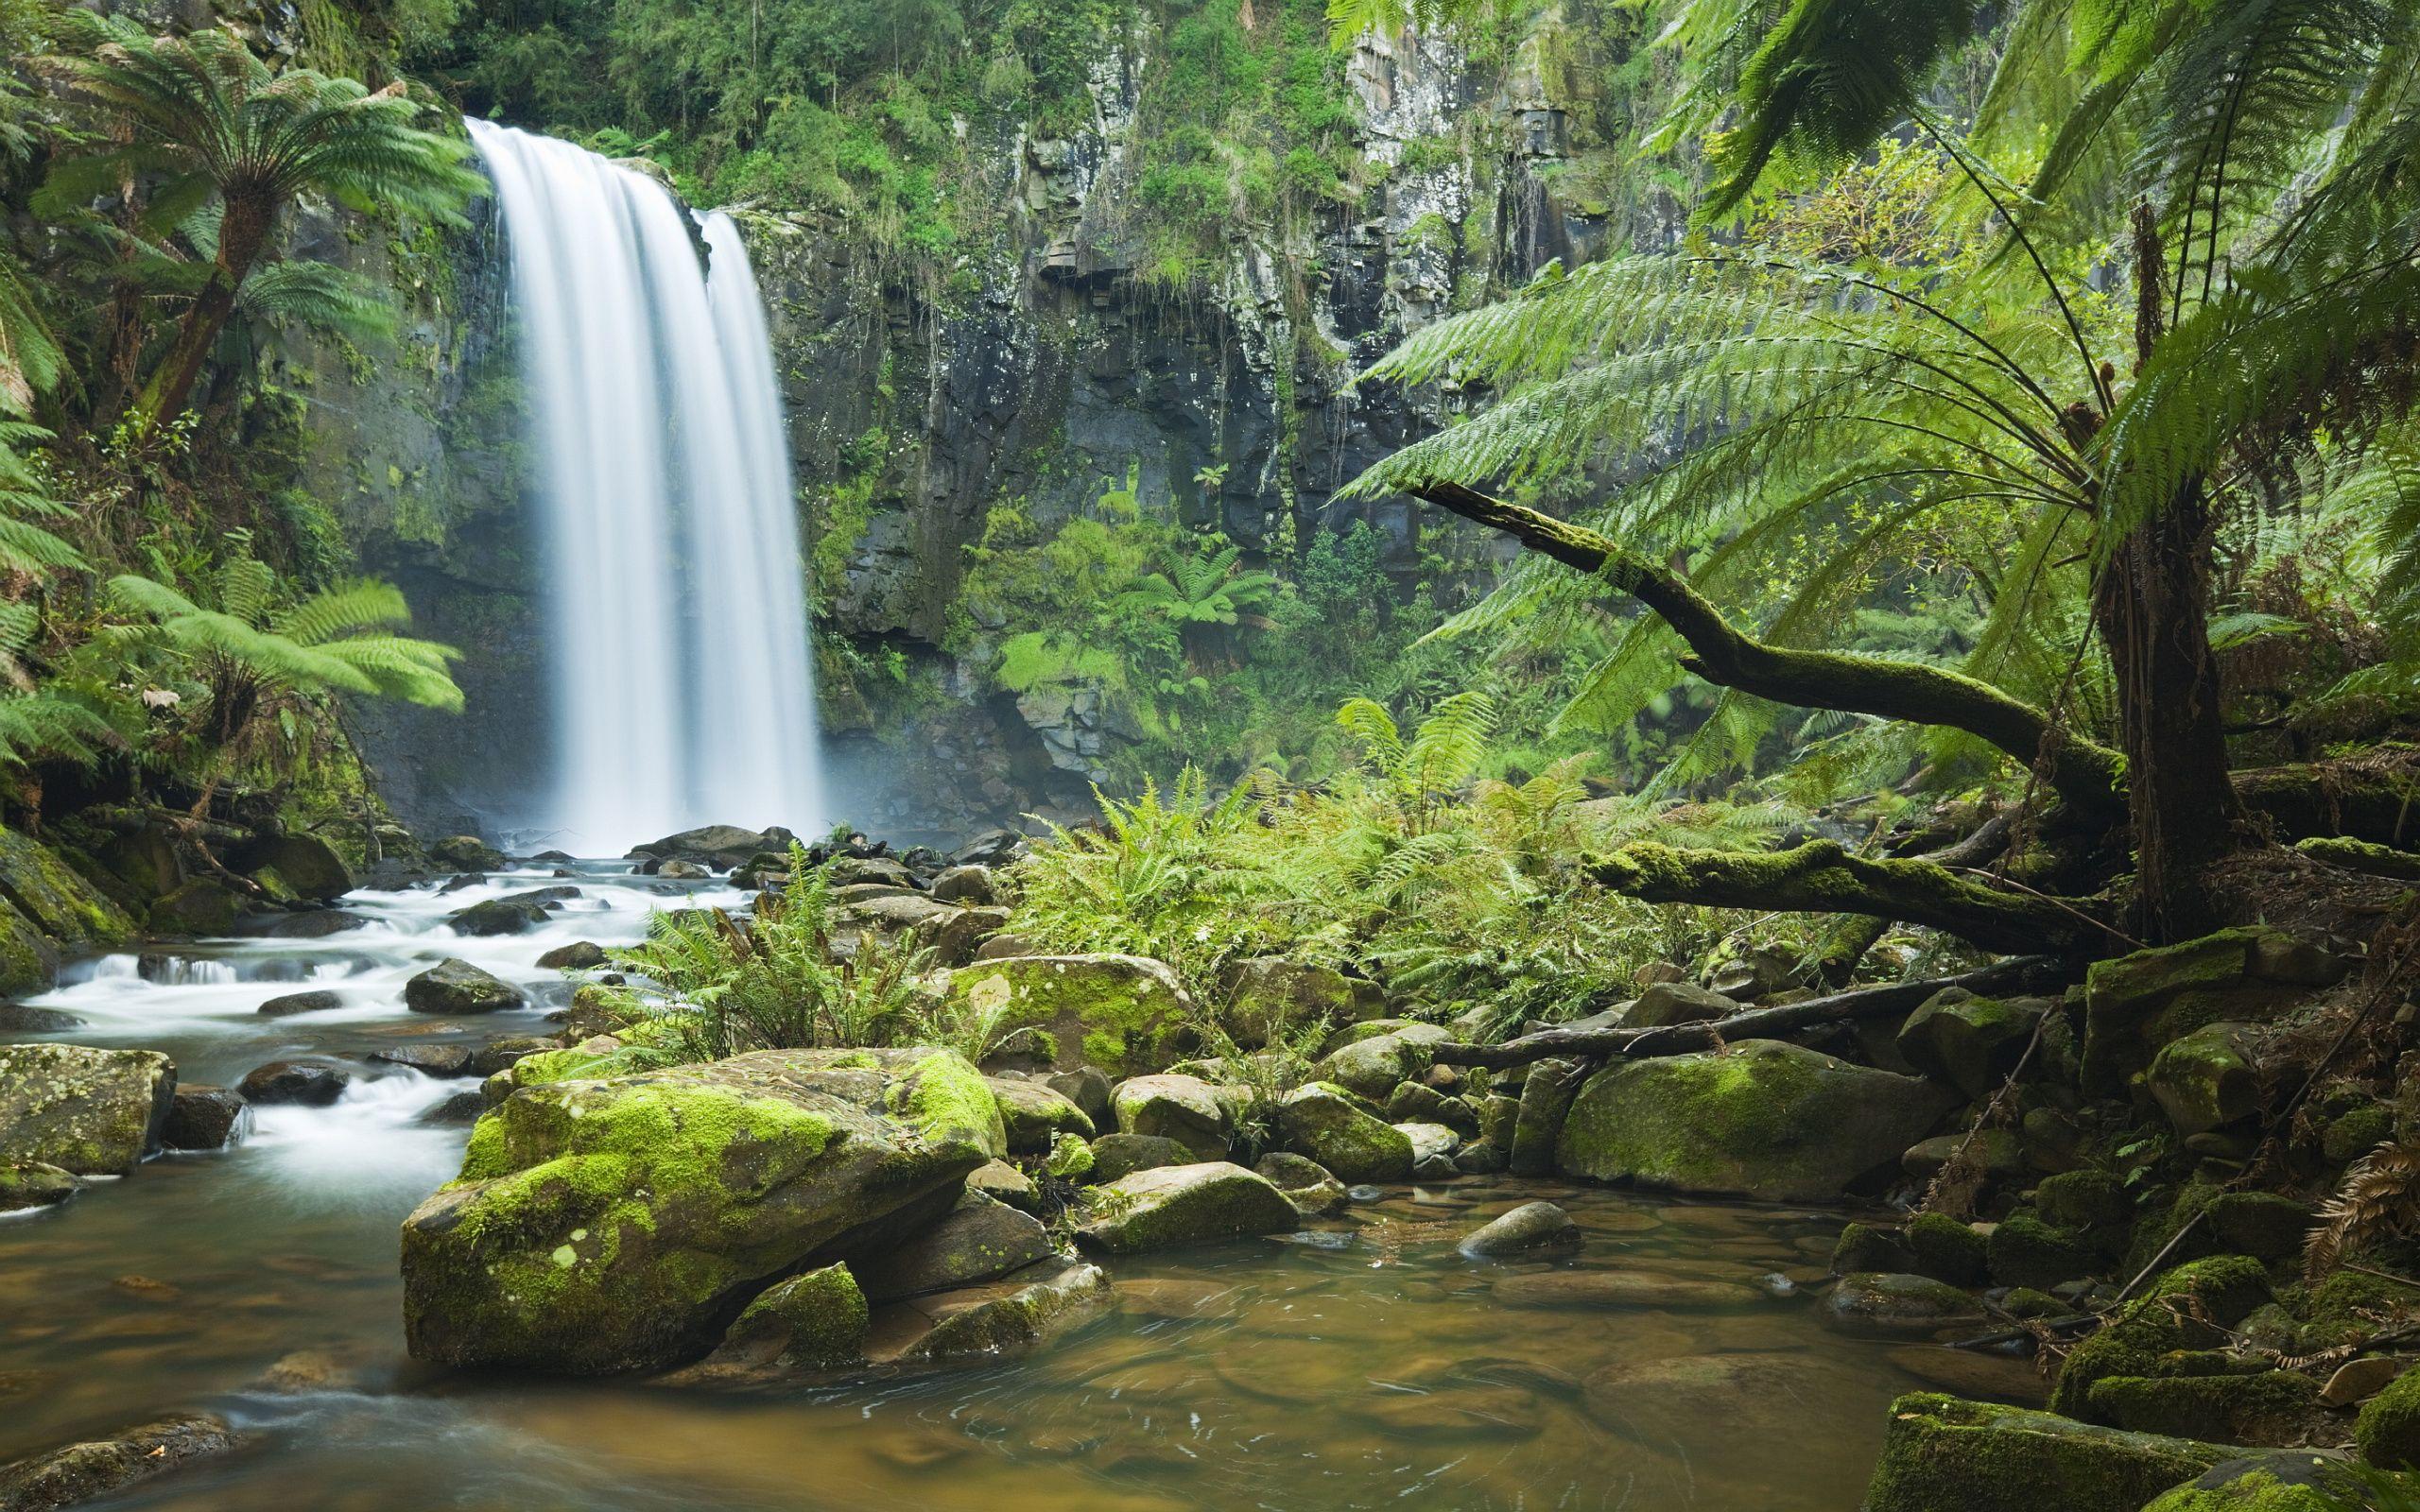 Rainforest Wallpapers Waterfall wallpaper, Waterfall